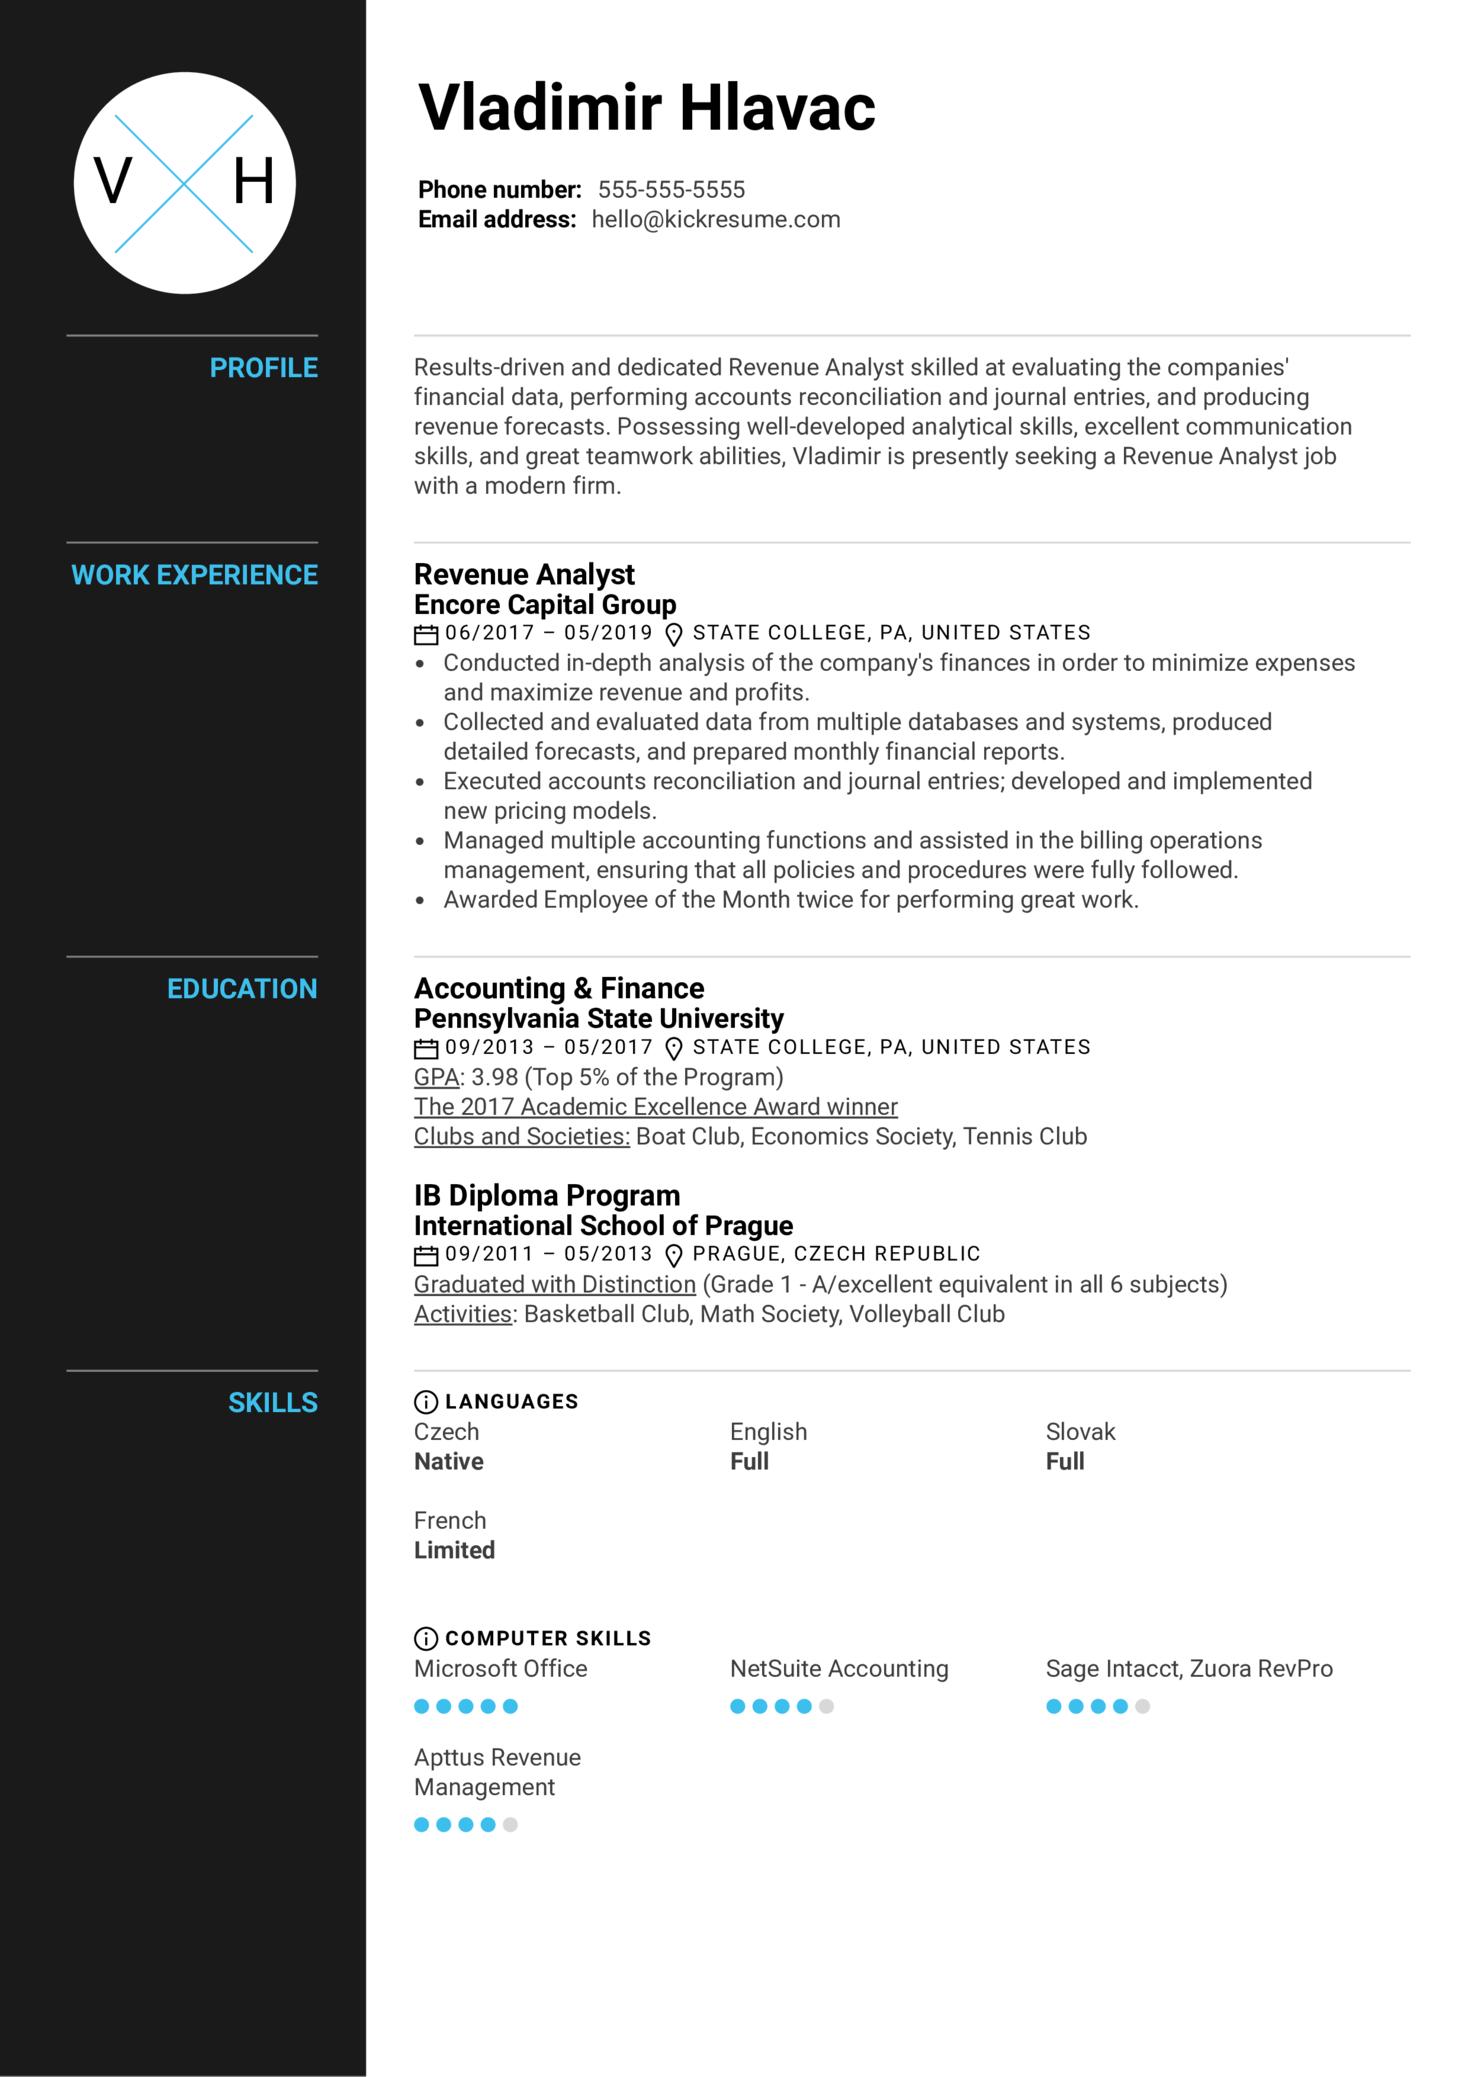 Revenue Analyst Resume Sample (Part 1)